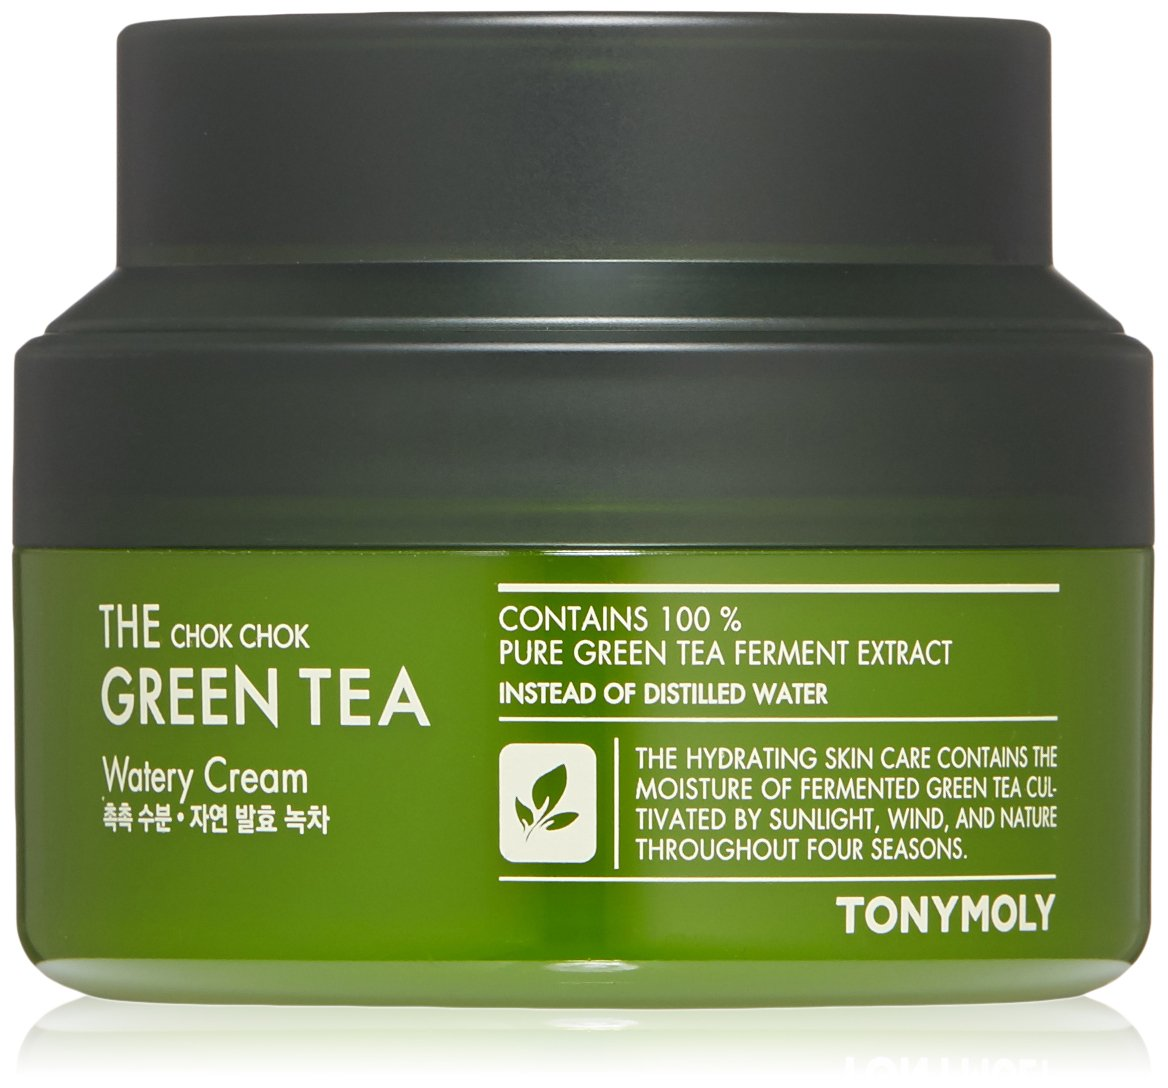 TONYMOLY The Chok Chok Green Tea Watery Cream